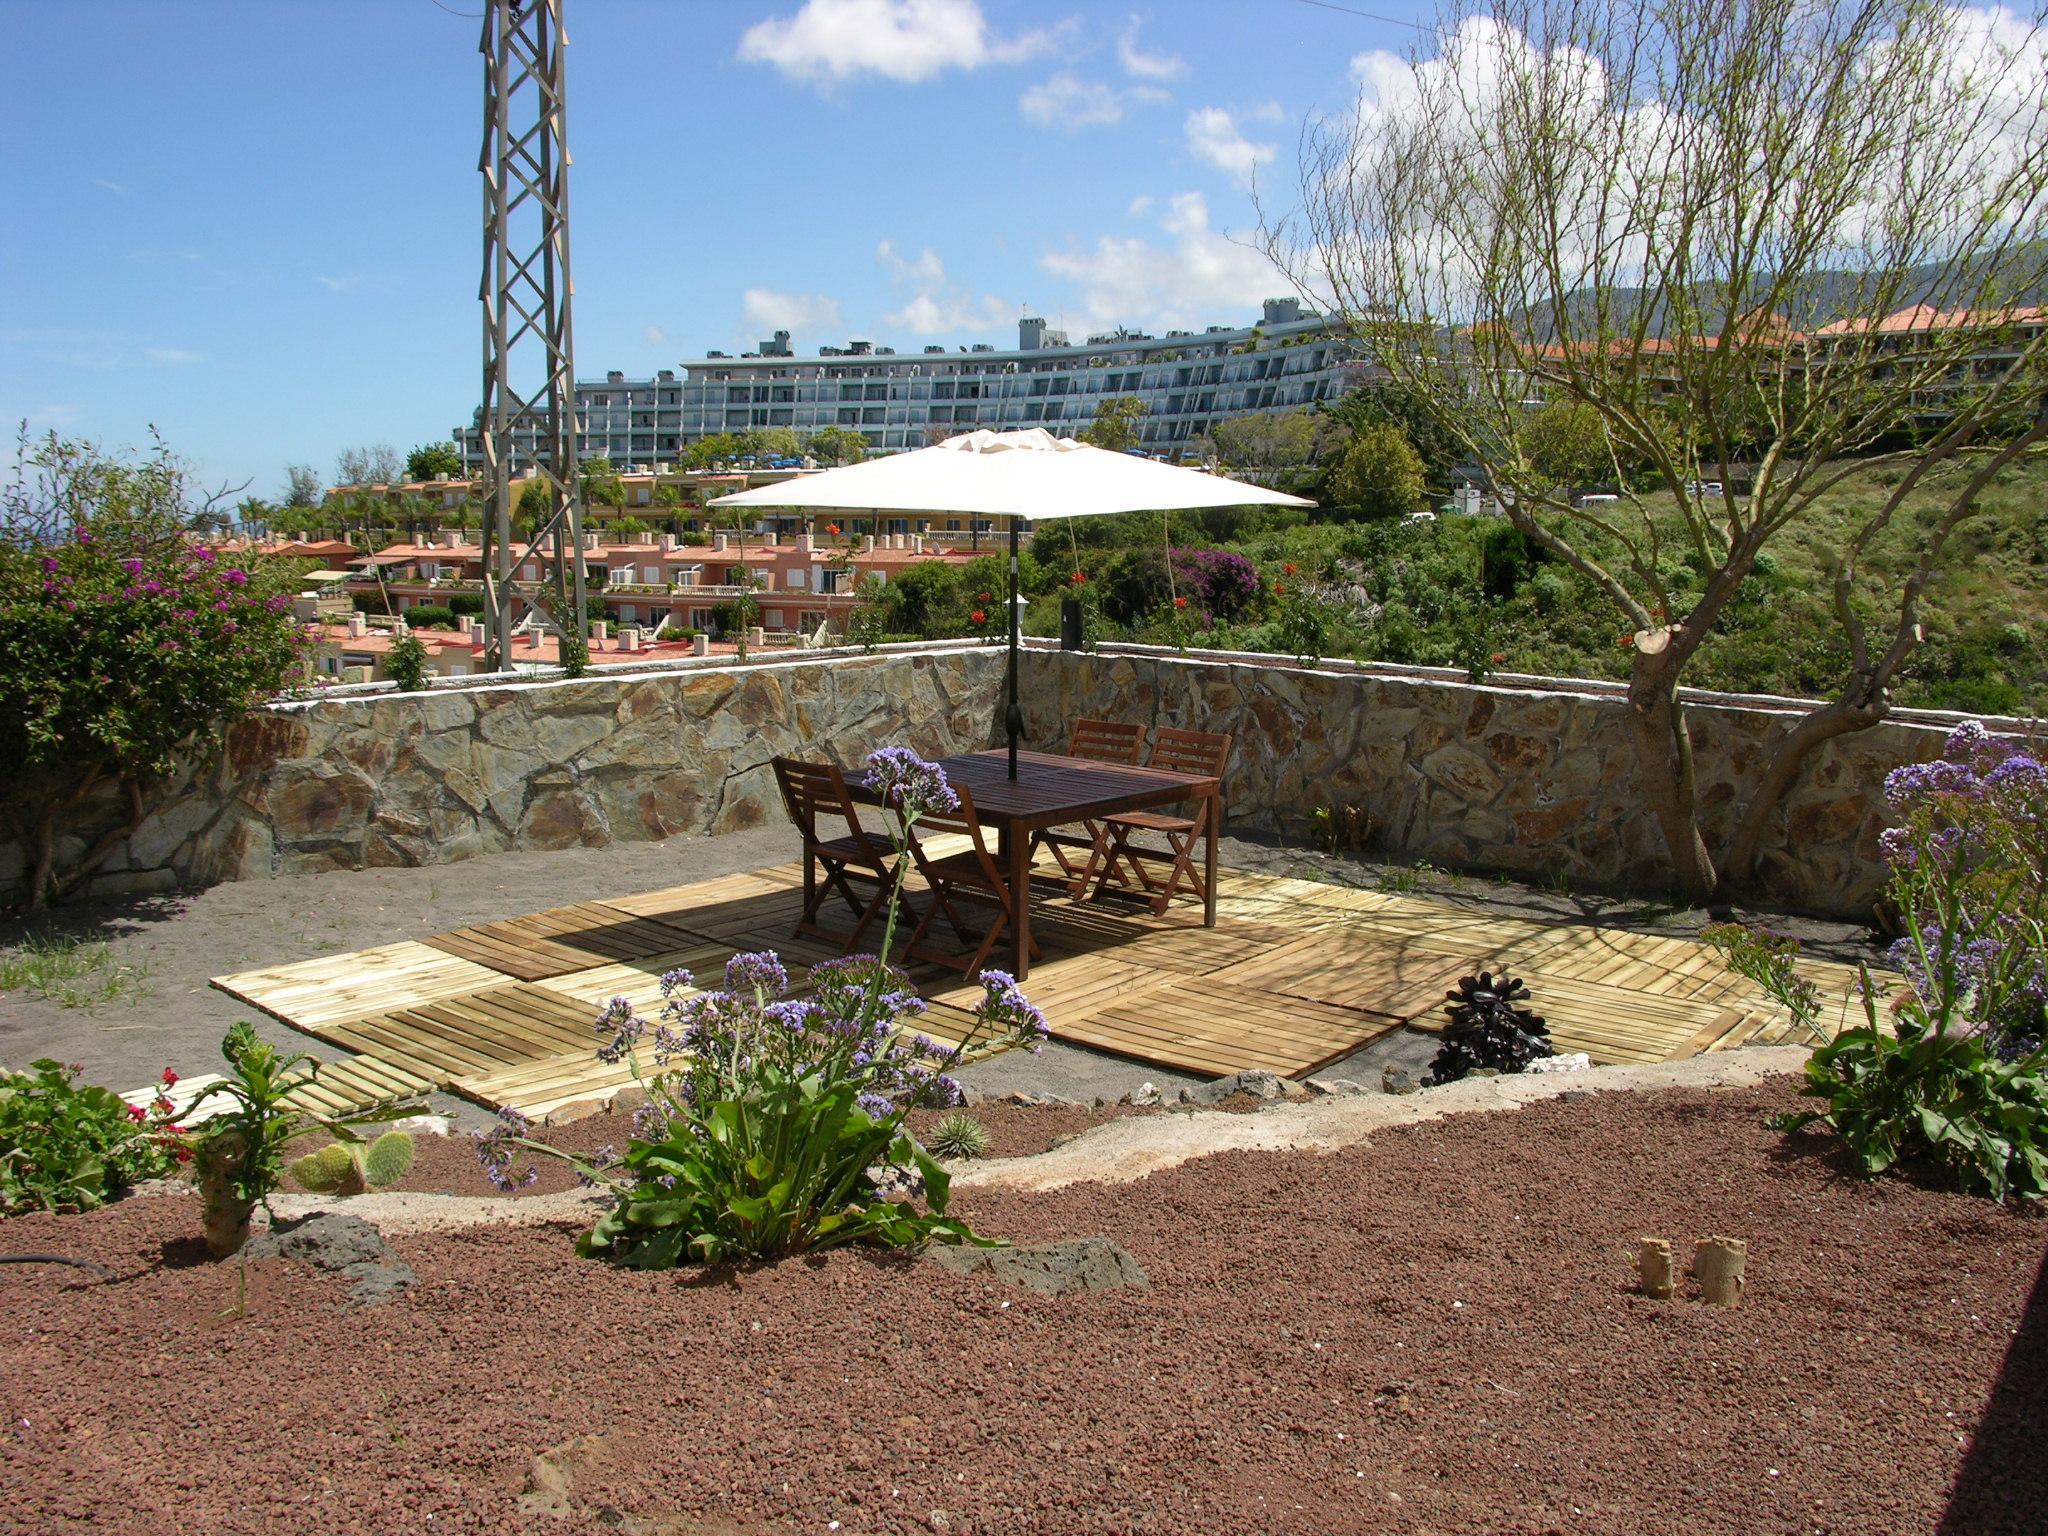 Maison de vacances Villa Vista La Quinta beheizbarer Pool kostenloses WLAN Grill (2124407), Santa Ursula, Ténérife, Iles Canaries, Espagne, image 13